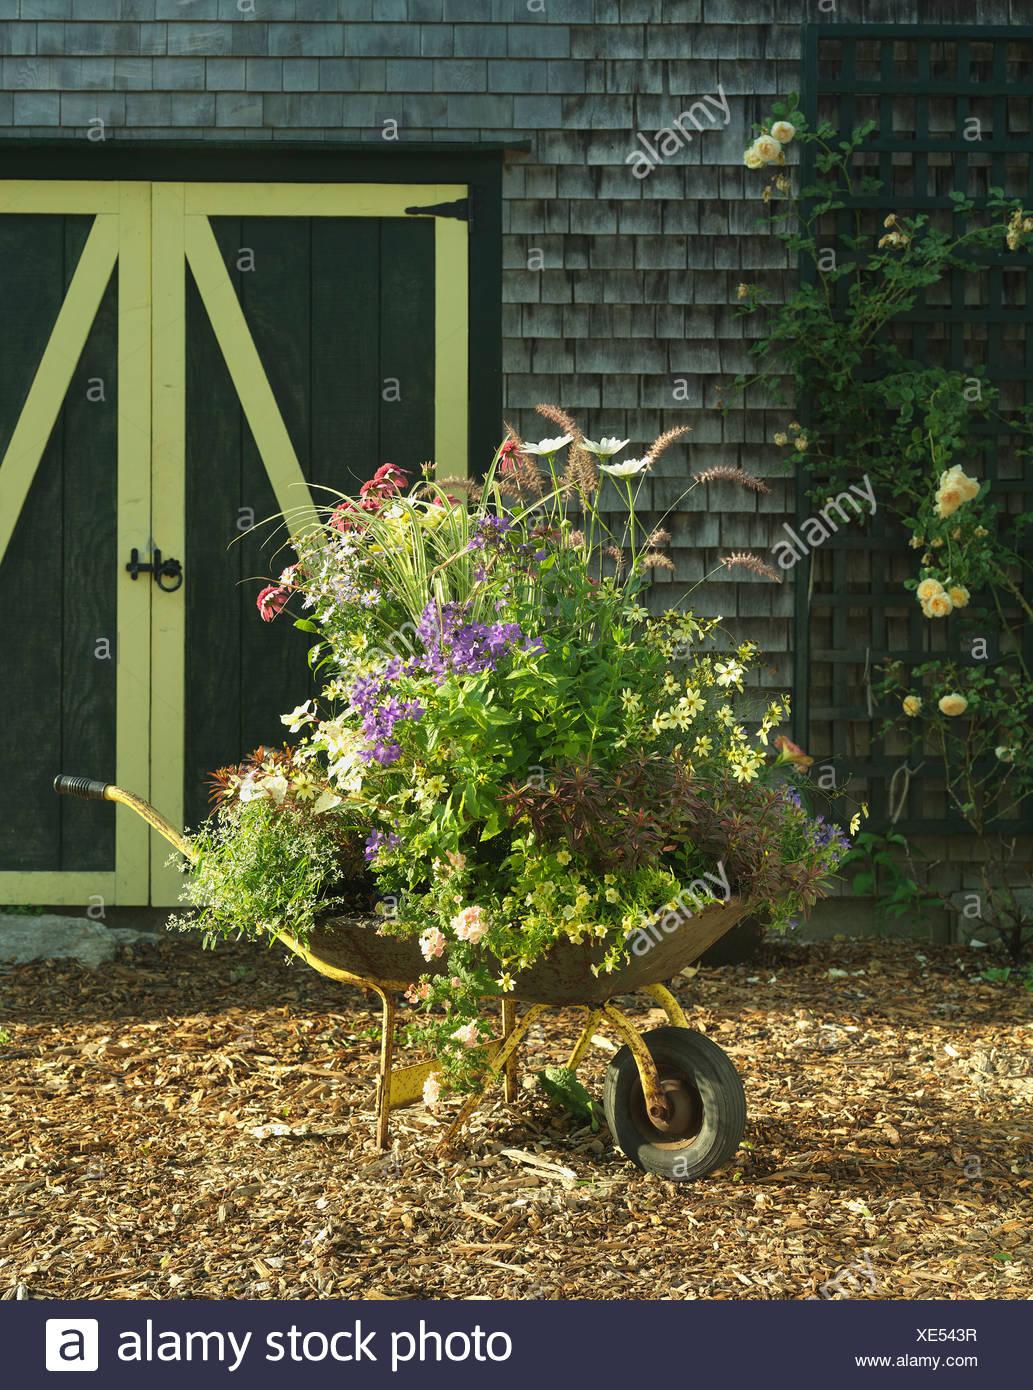 Painted Wheelbarrow Stock Photos & Painted Wheelbarrow Stock Images ...